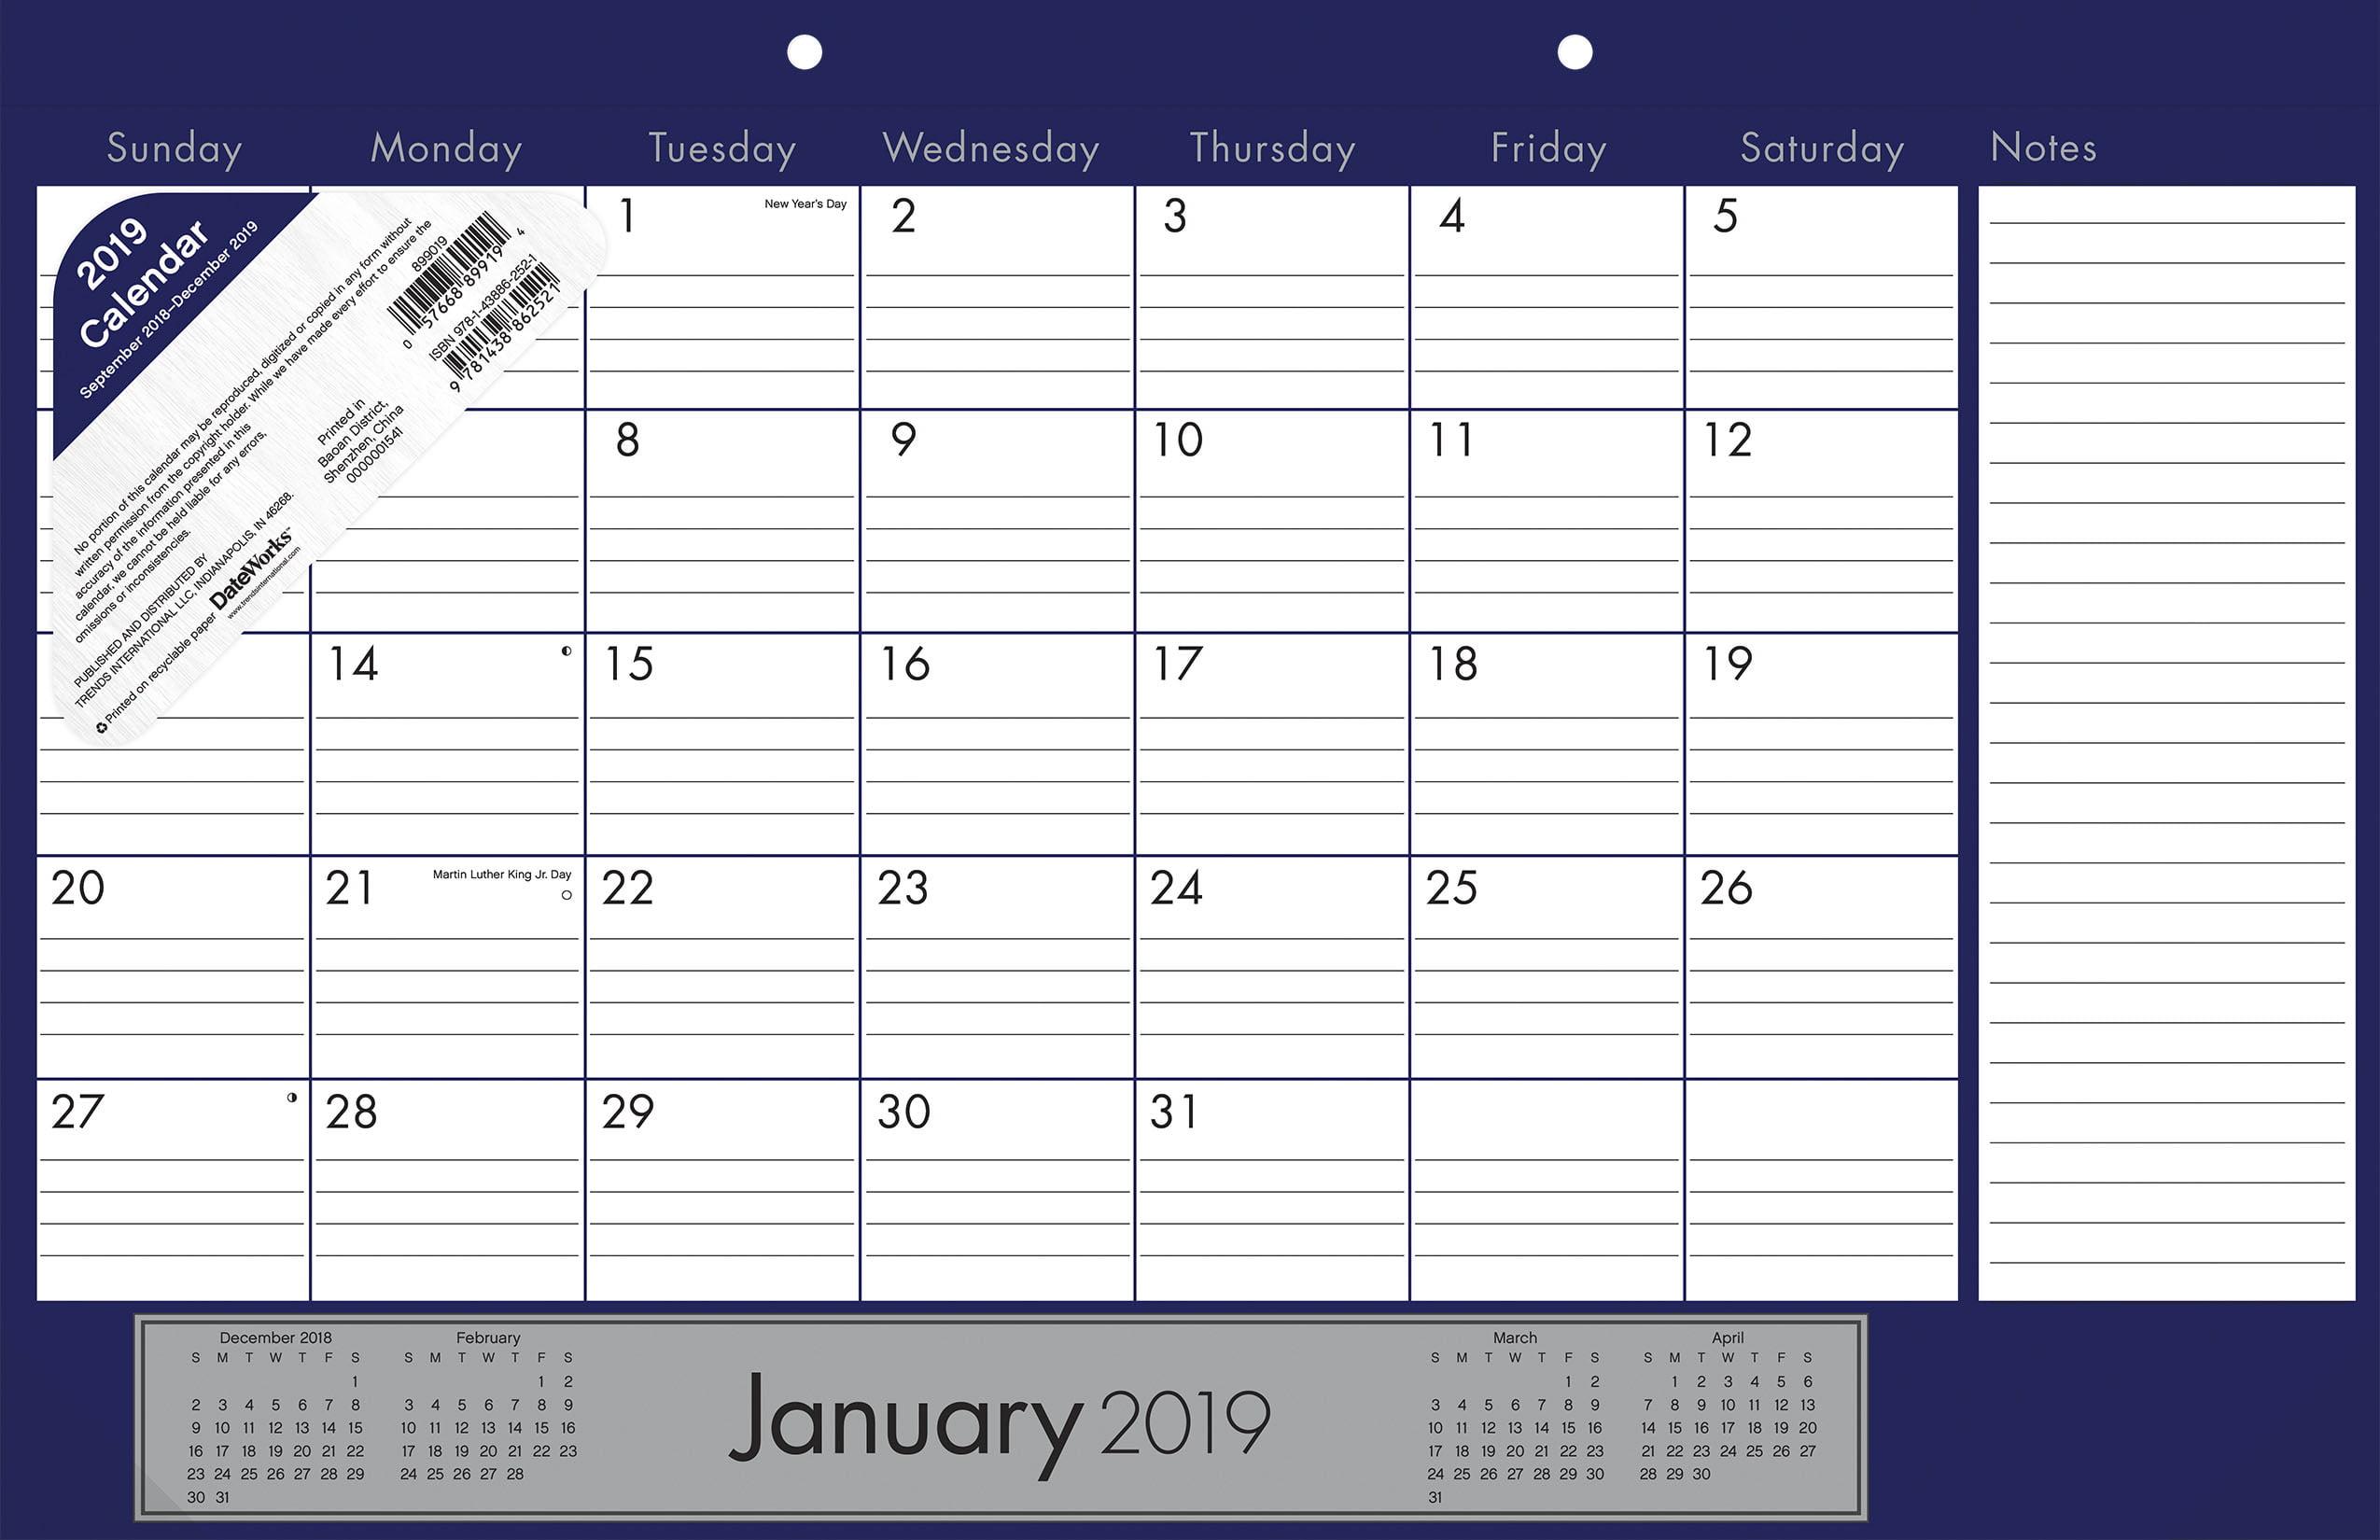 2019 Classic Desk Pad Calendar by Trends International